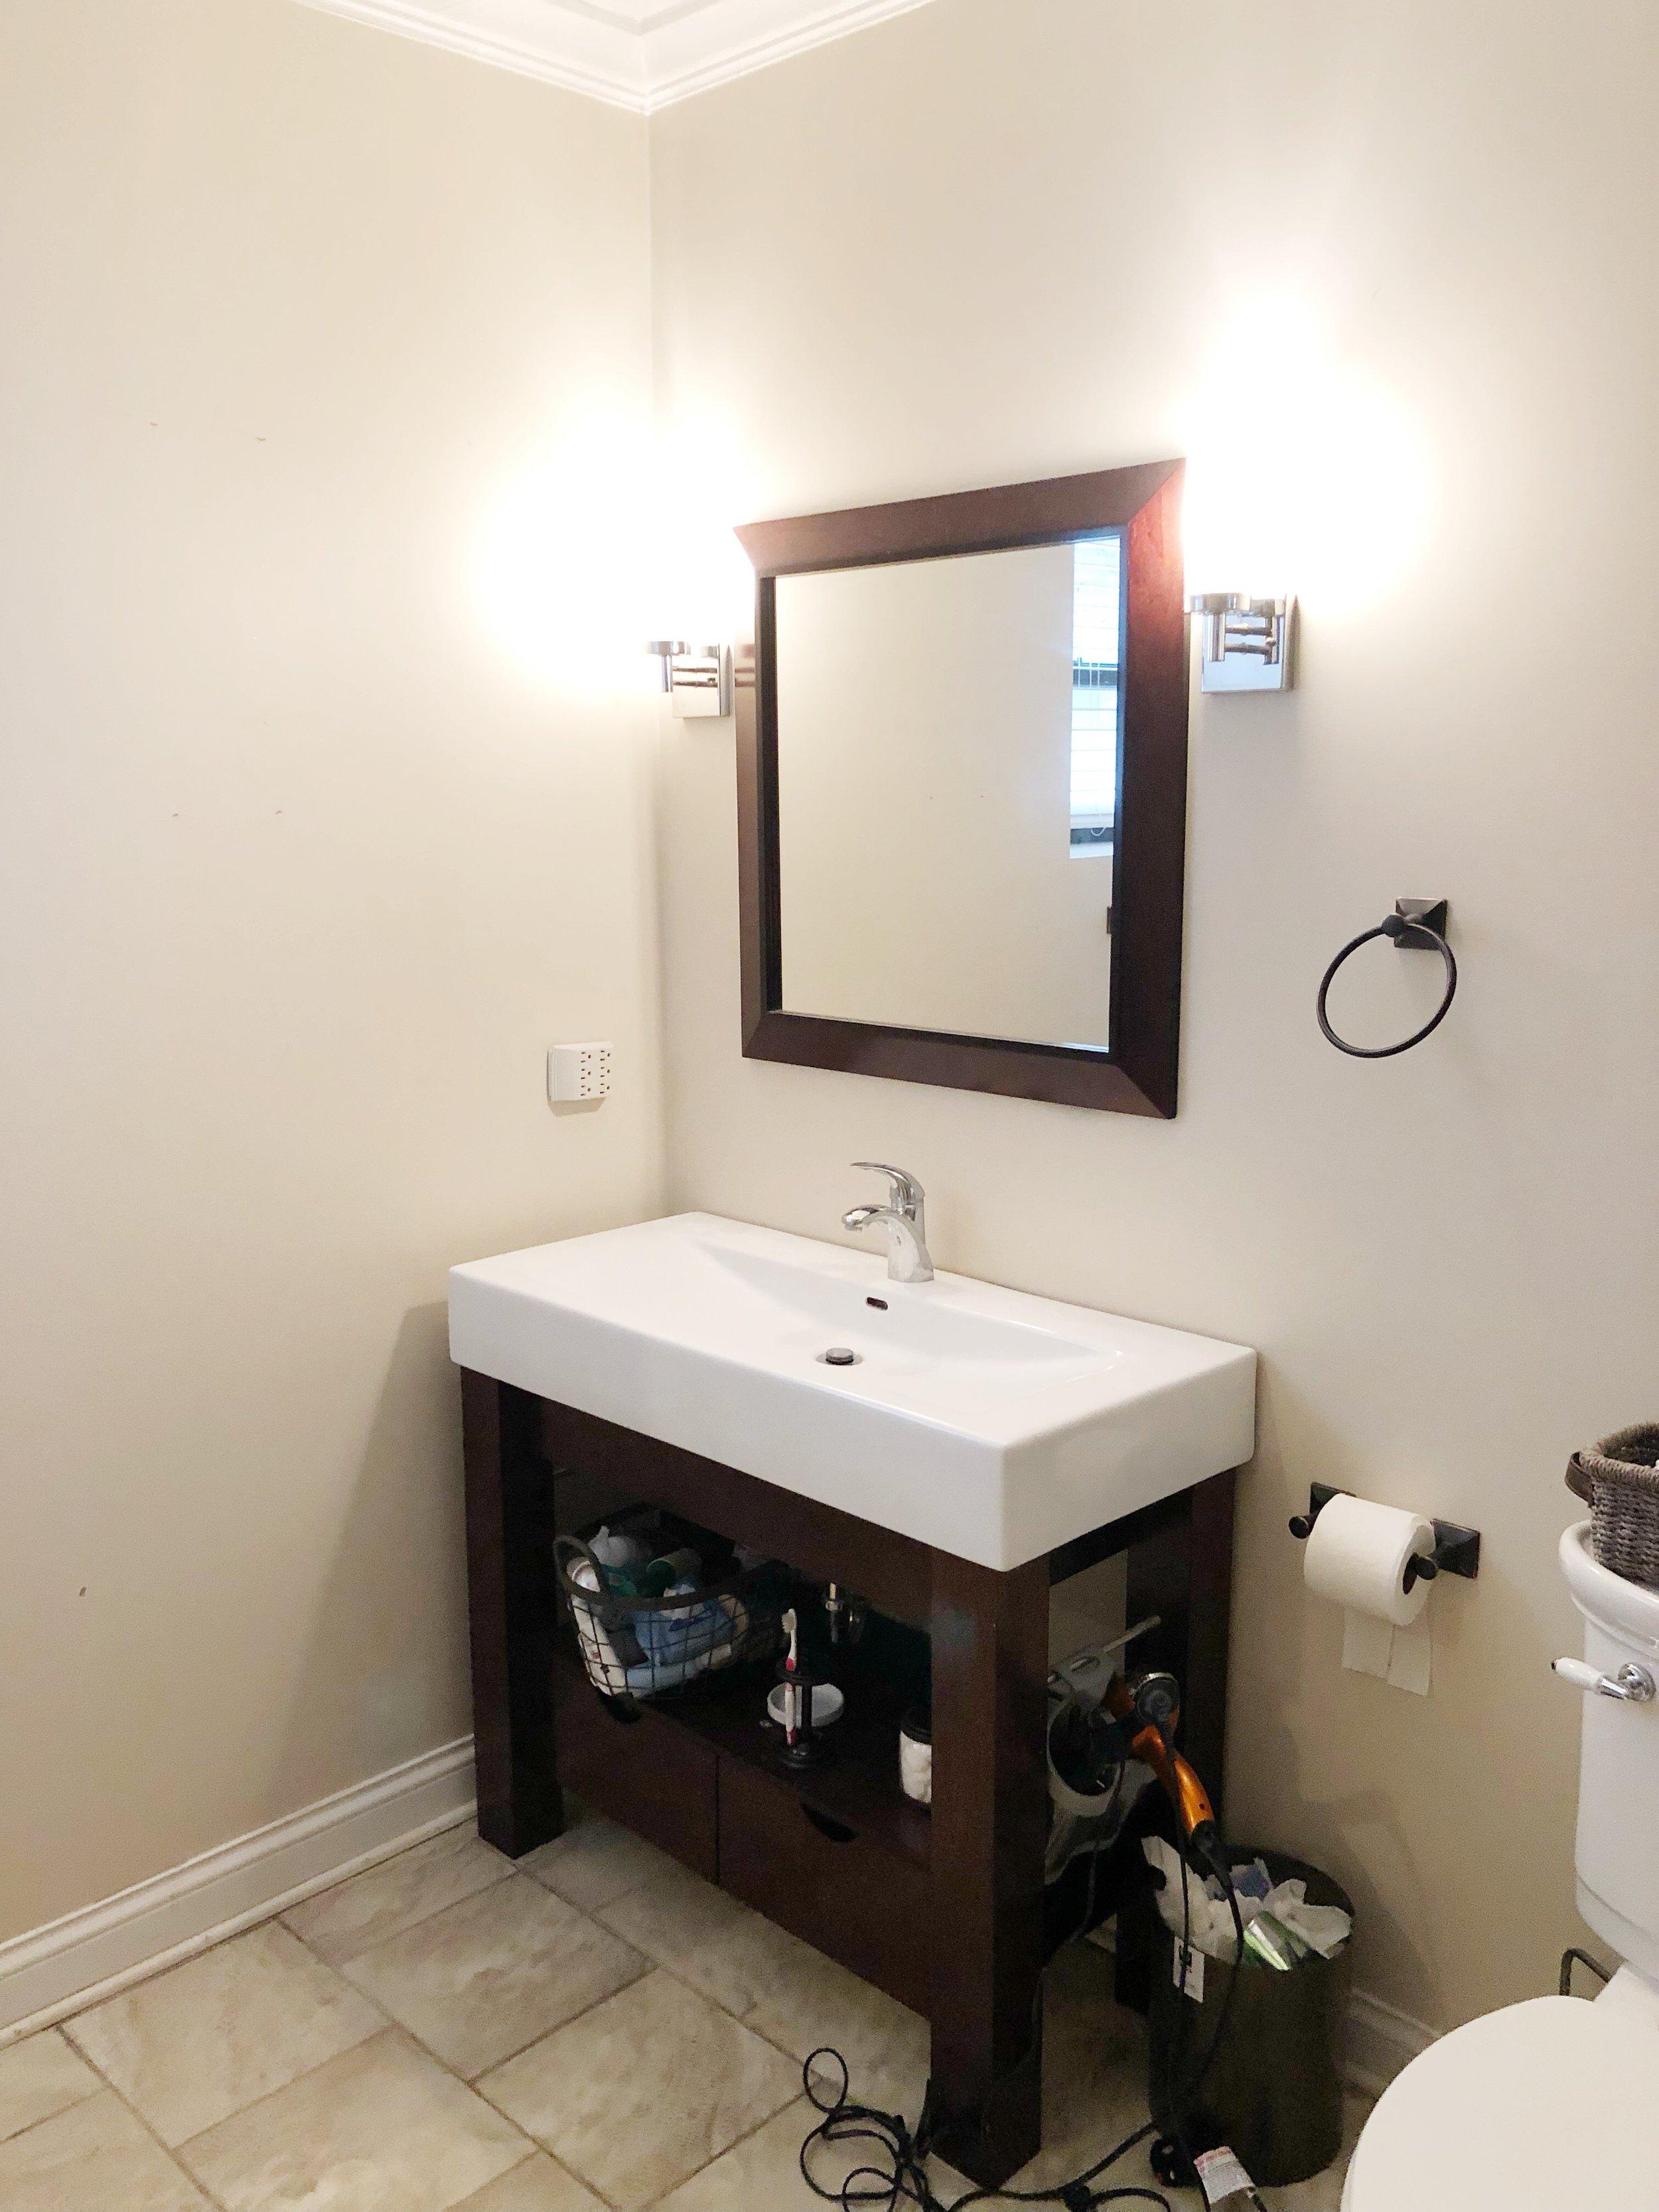 Original vanity & mirror combo. Plus broken trash can with no lid :)